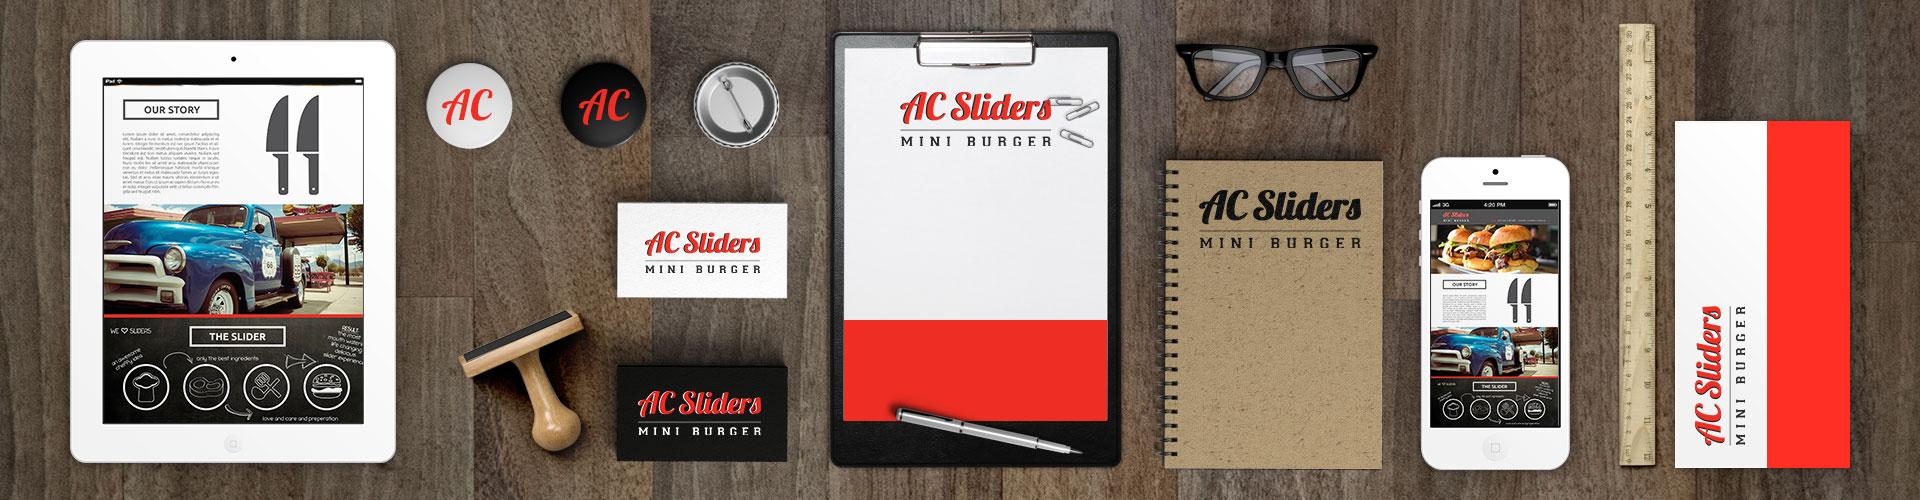 ac-sliders-img-banner